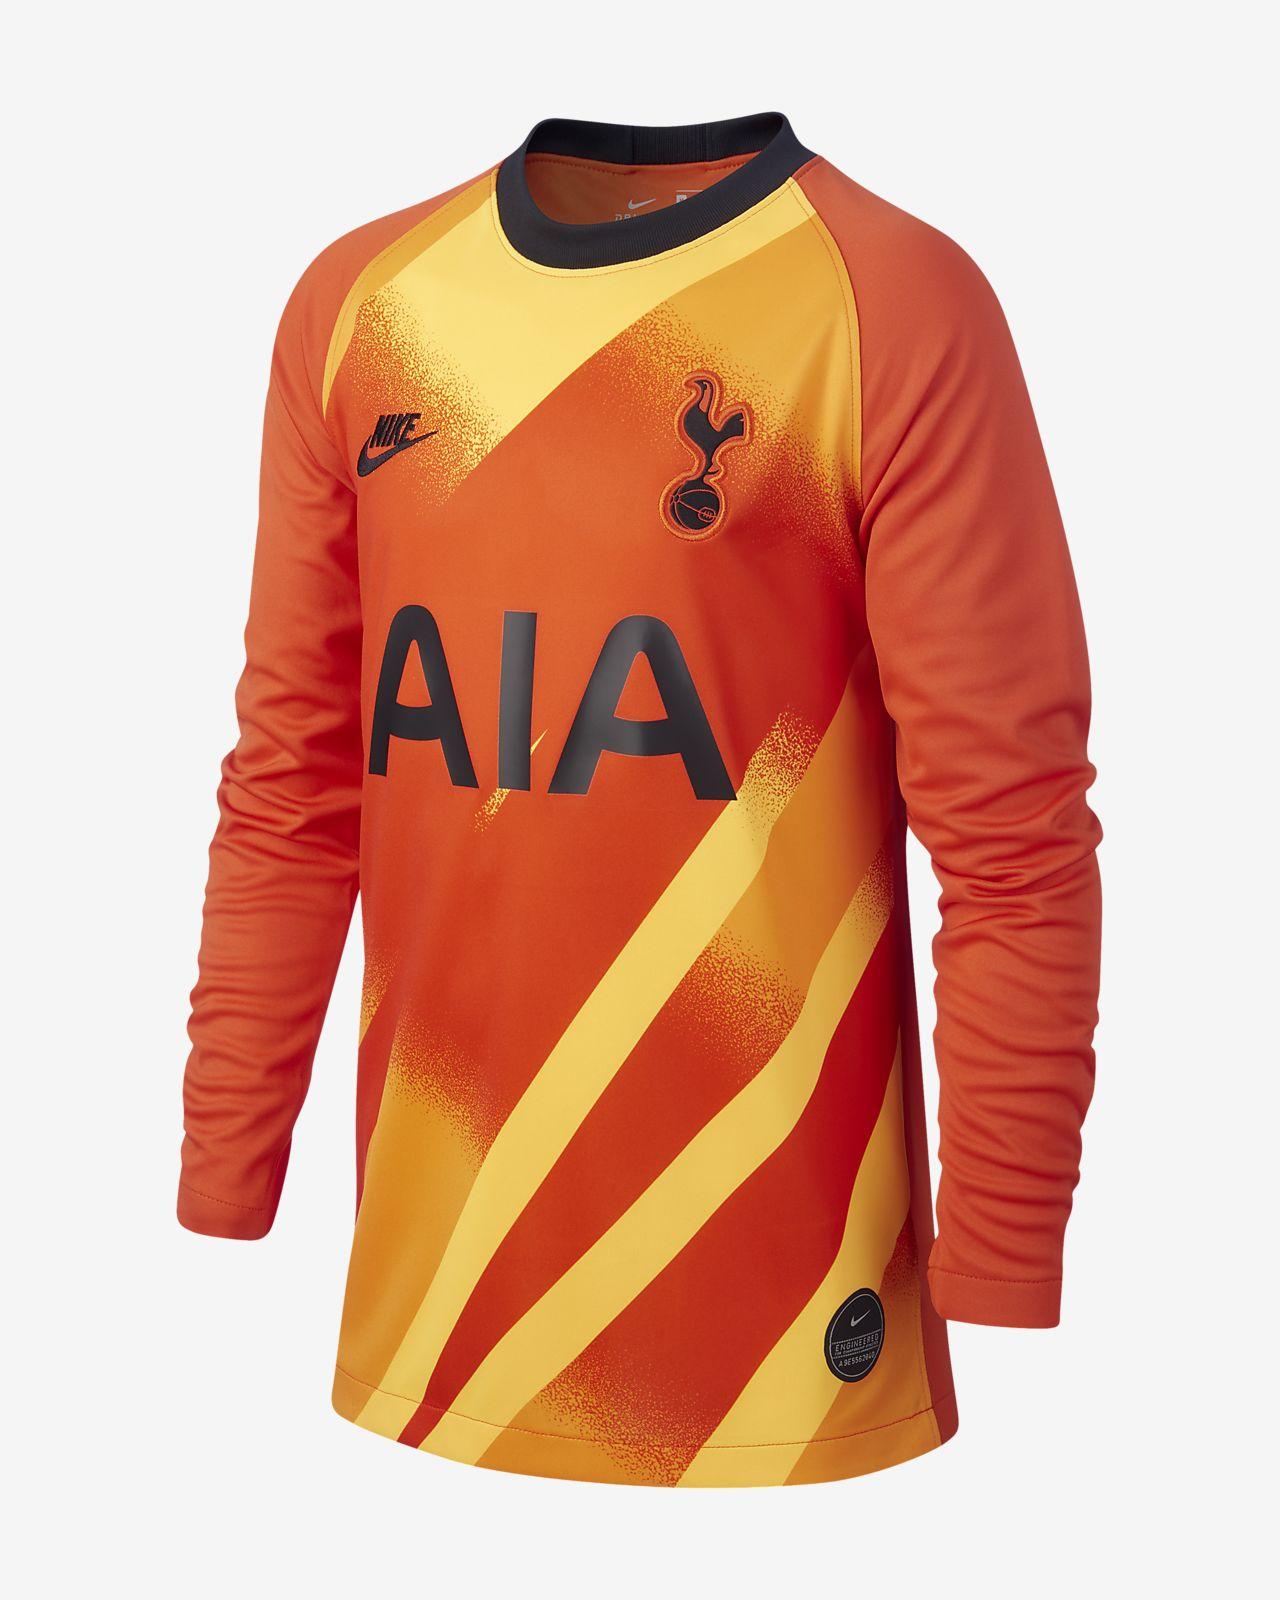 Camisola de futebol Tottenham Hotspur 2019/20 Stadium Goalkeeper Júnior